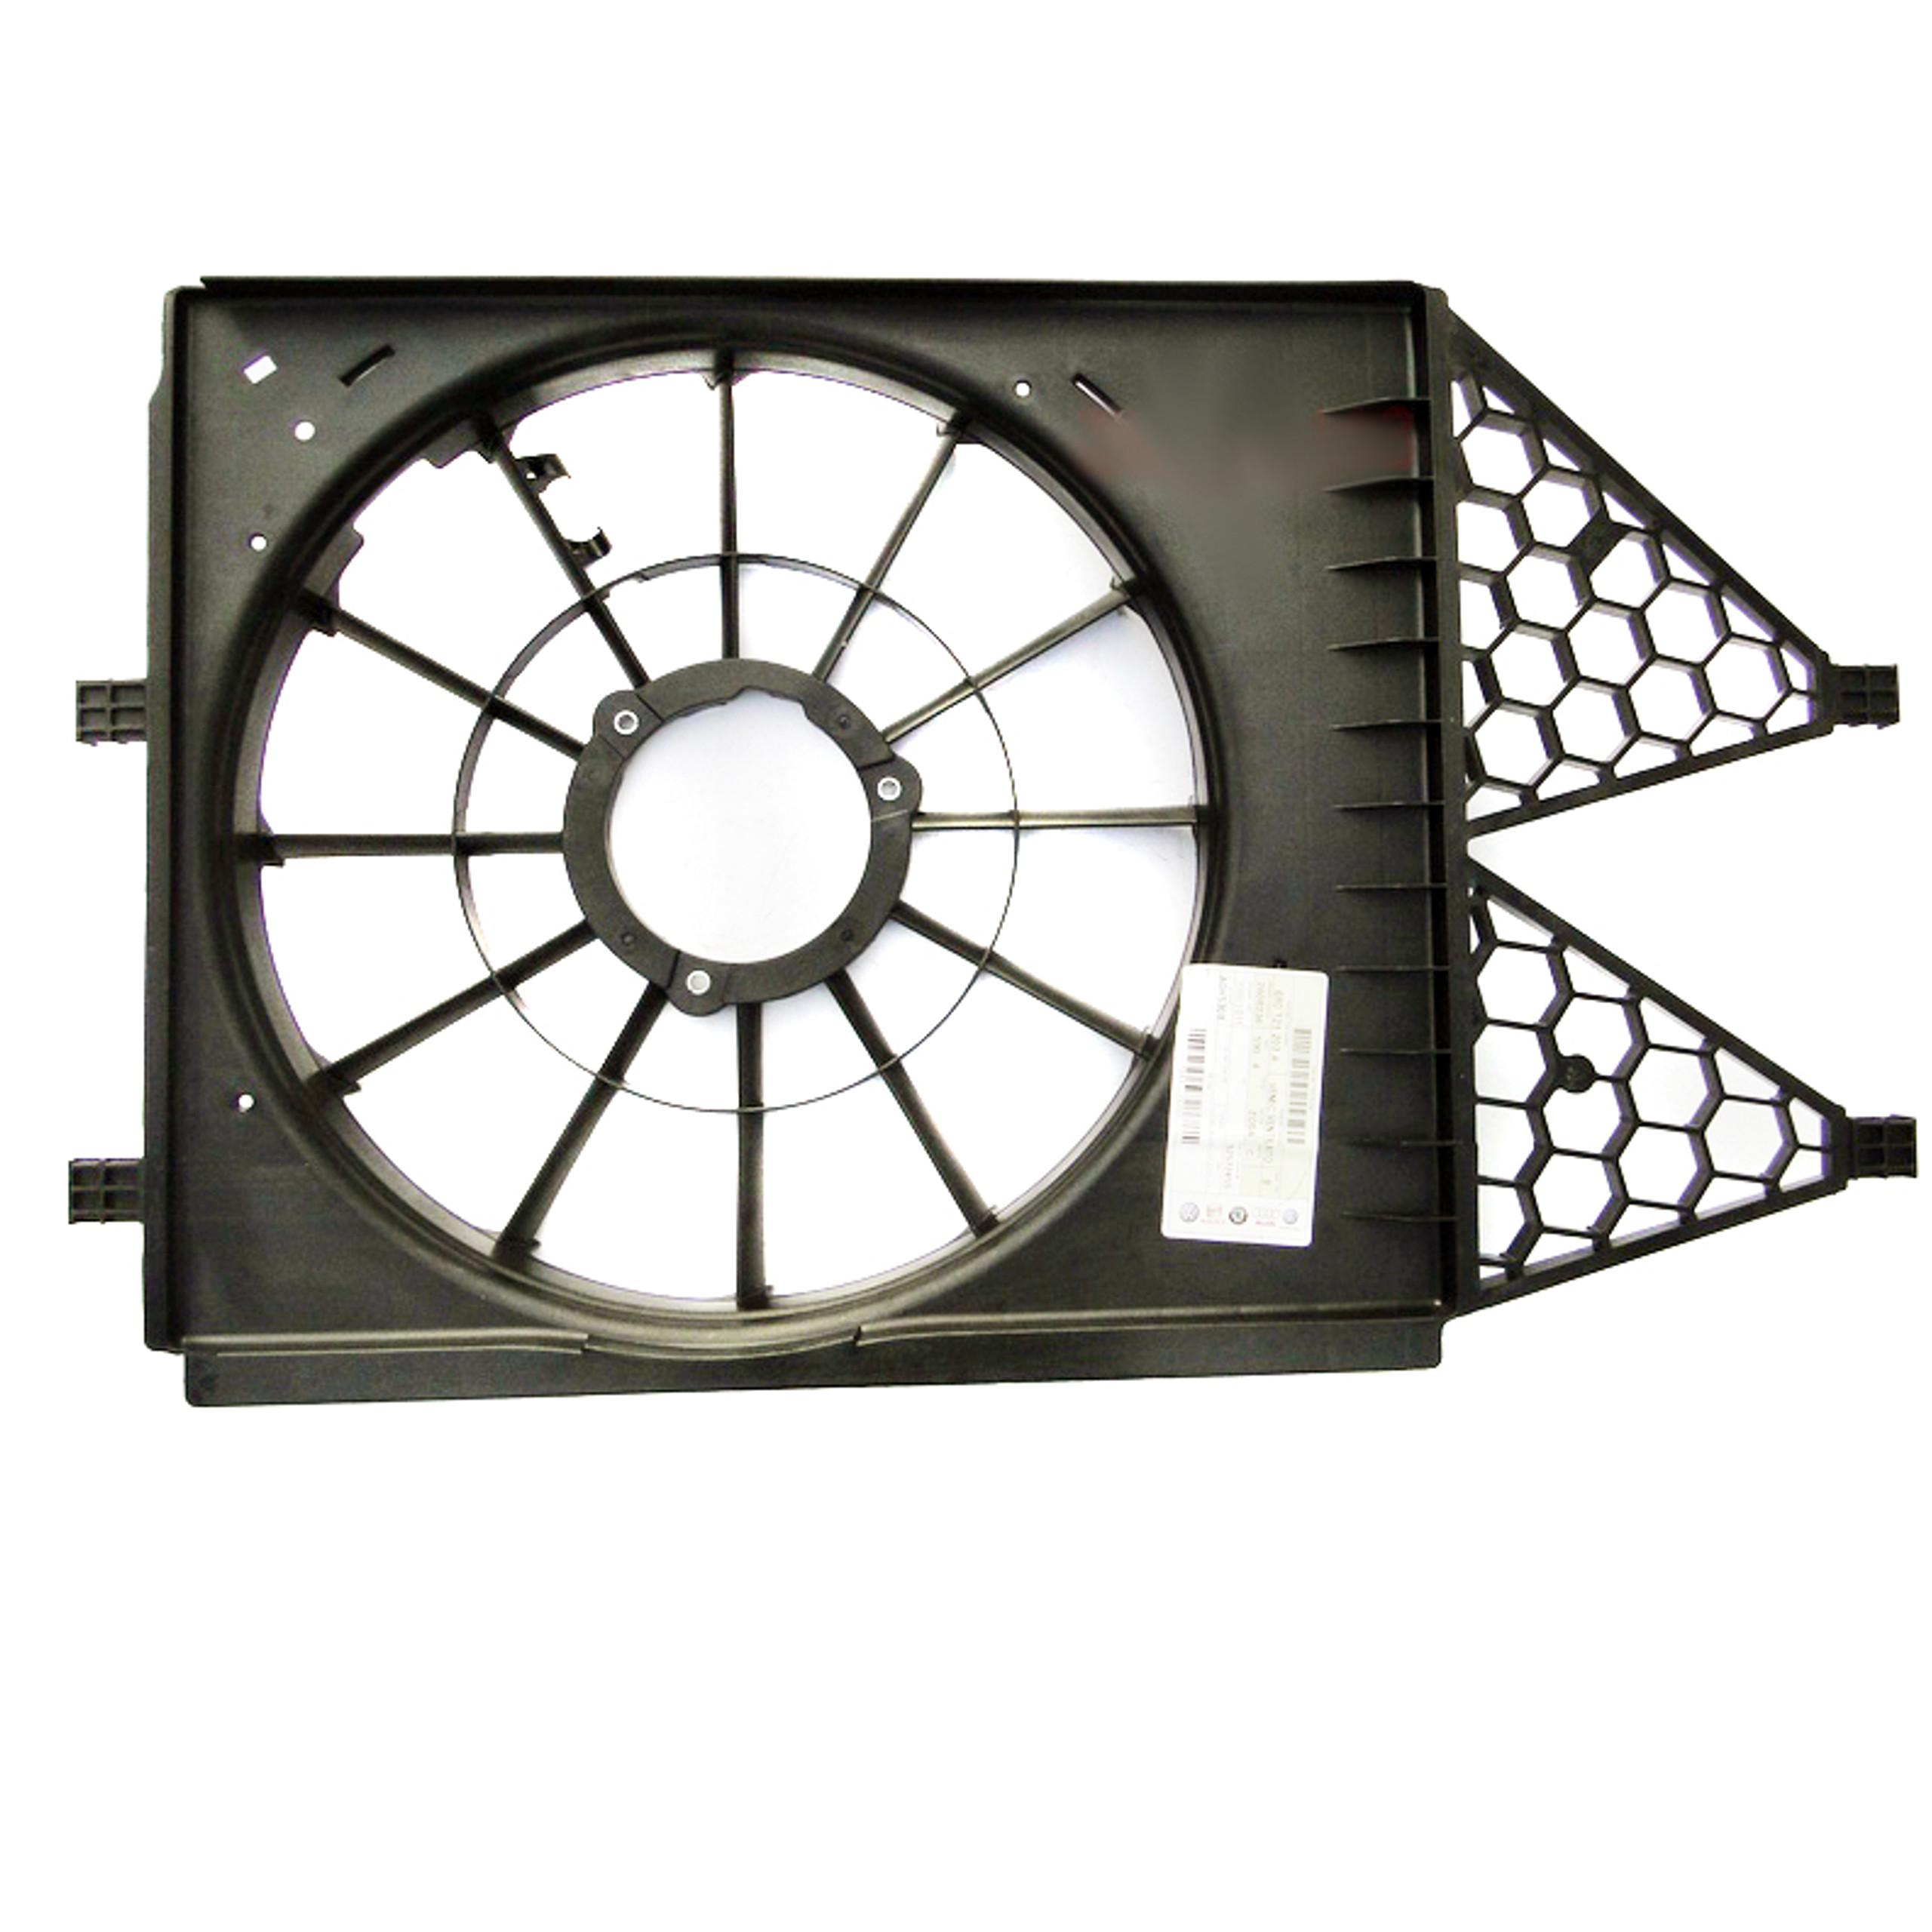 крышка корпус стойка вентилятора поло ibiza